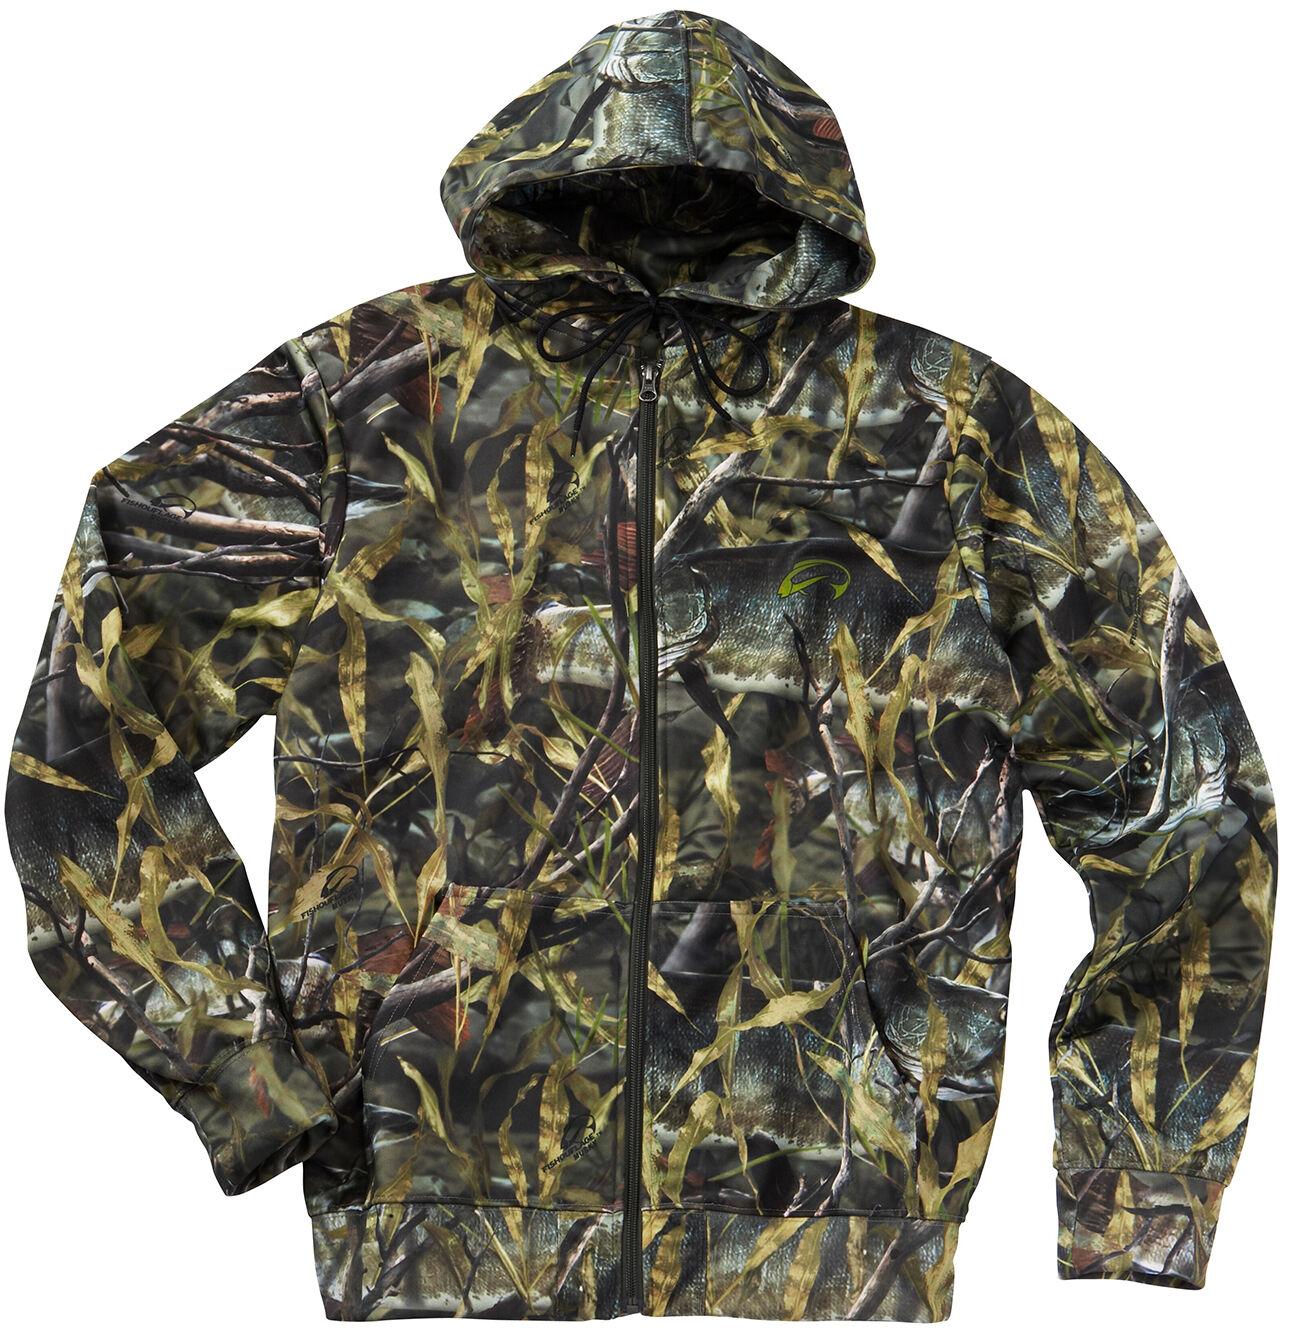 Fishouflage Full Zip Performance Fishing Hoodie - Musky Camo Pattern - Size M